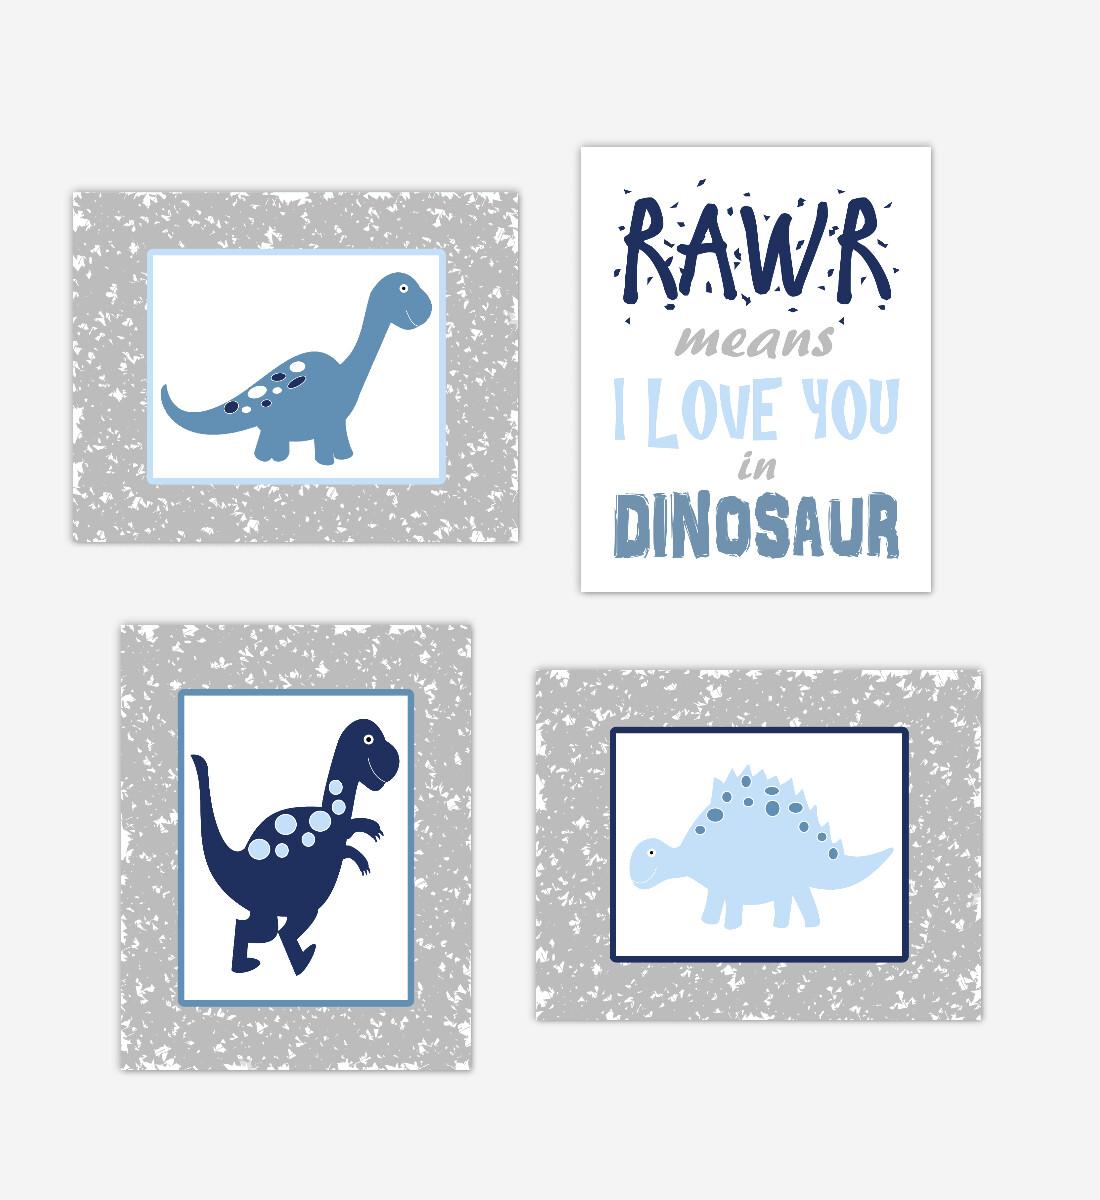 Dinosaur Baby Boy Nursery Wall Art Navy Blue Gray Dinos Print Baby Nursery Decor Playroom RAWR Means I Love You In Dinosaur